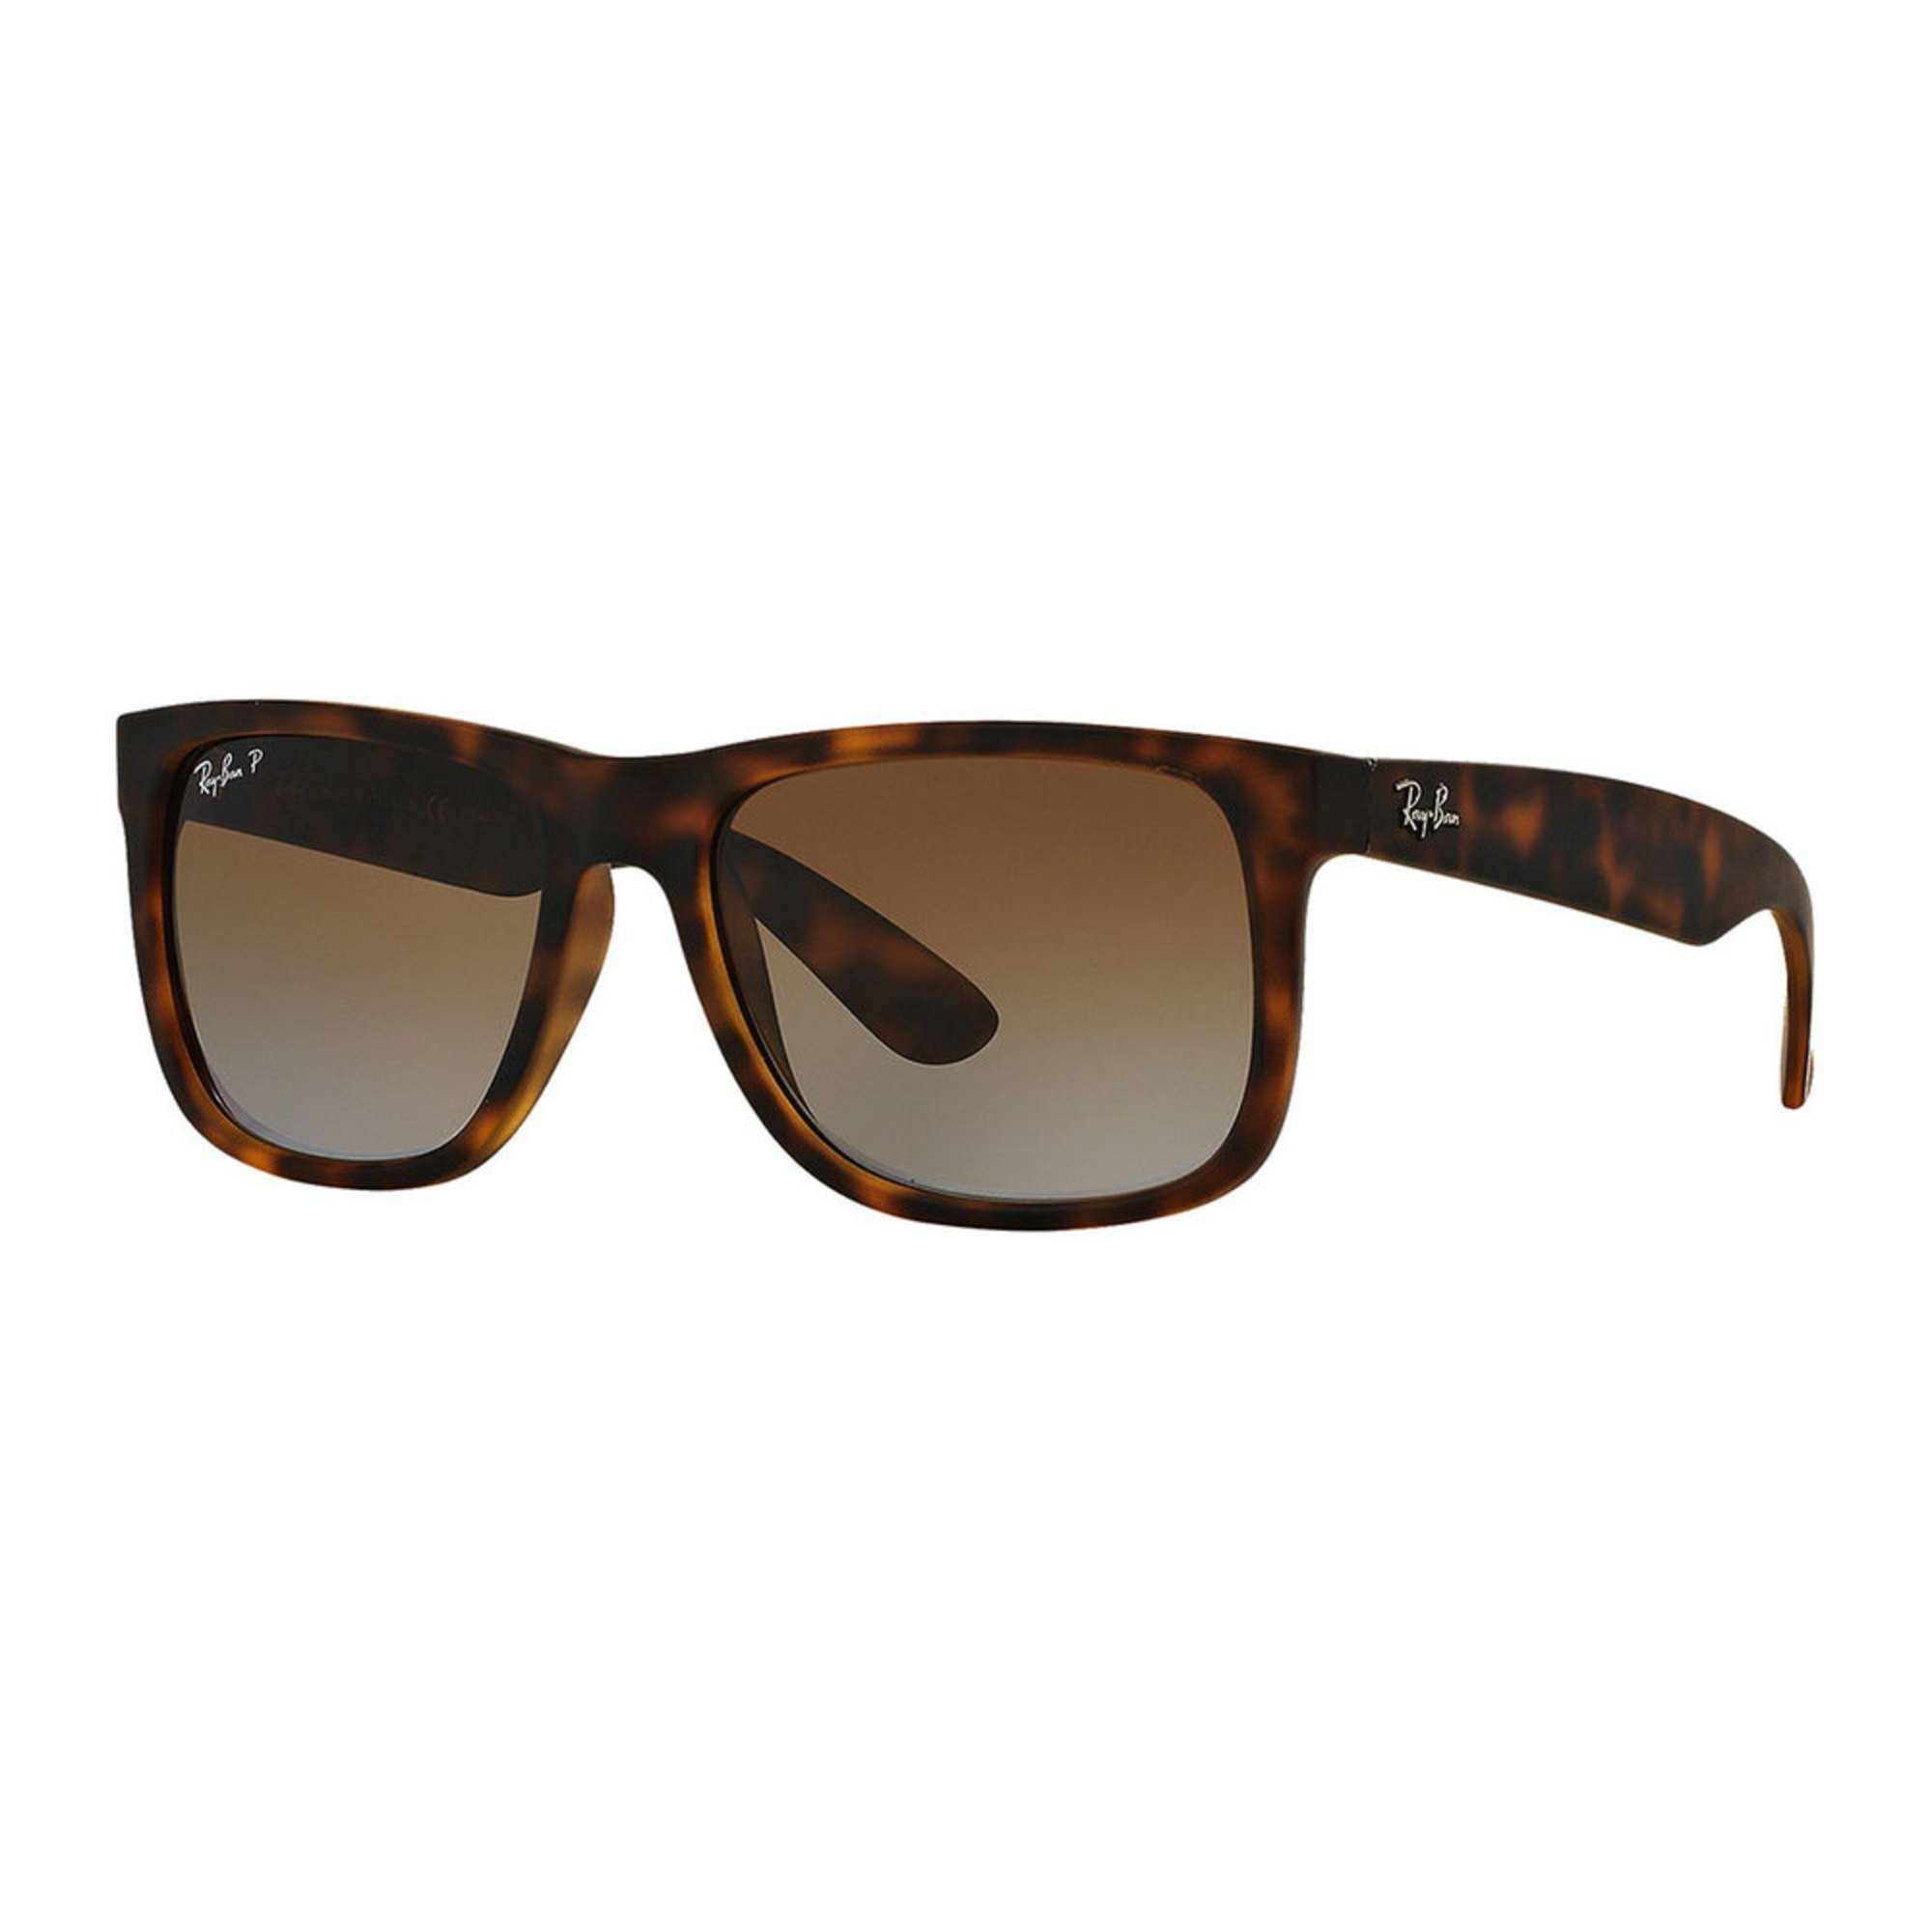 d5df1b25a7 Ray-Ban. Ray-Ban Men s Polarized Justin Classic Sunglasses